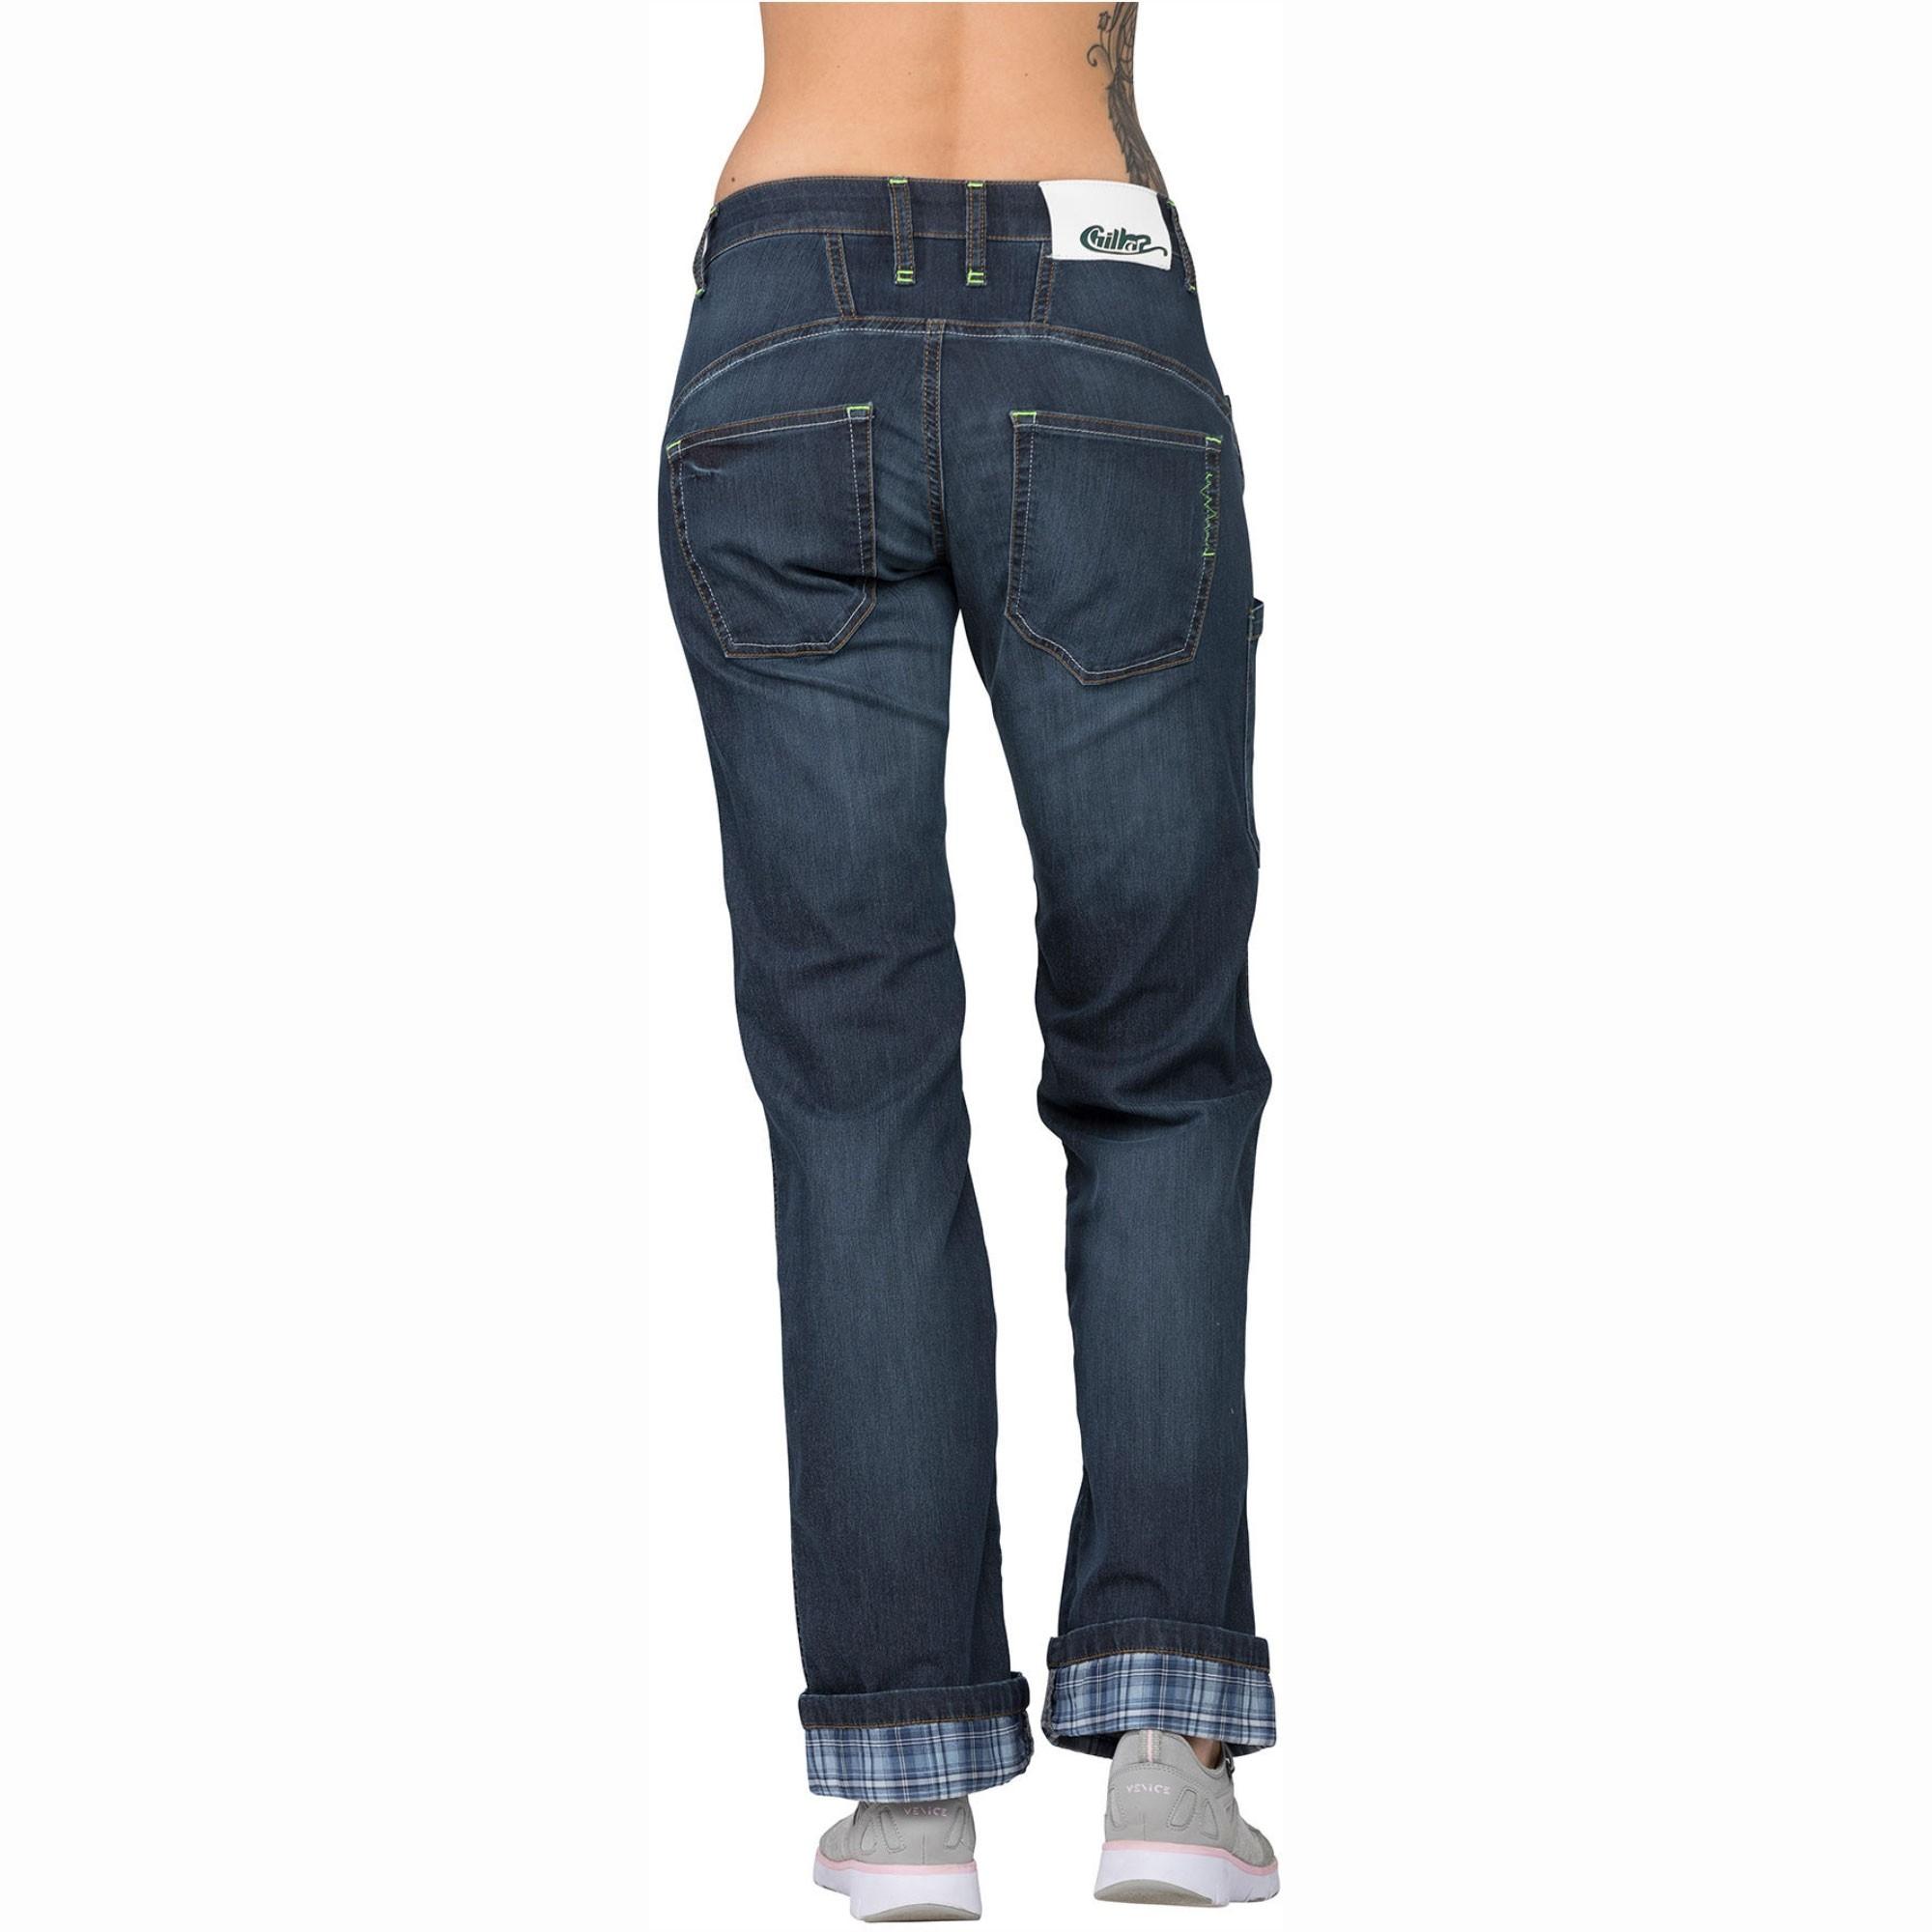 Chillaz Women's Working Pants - Indigo